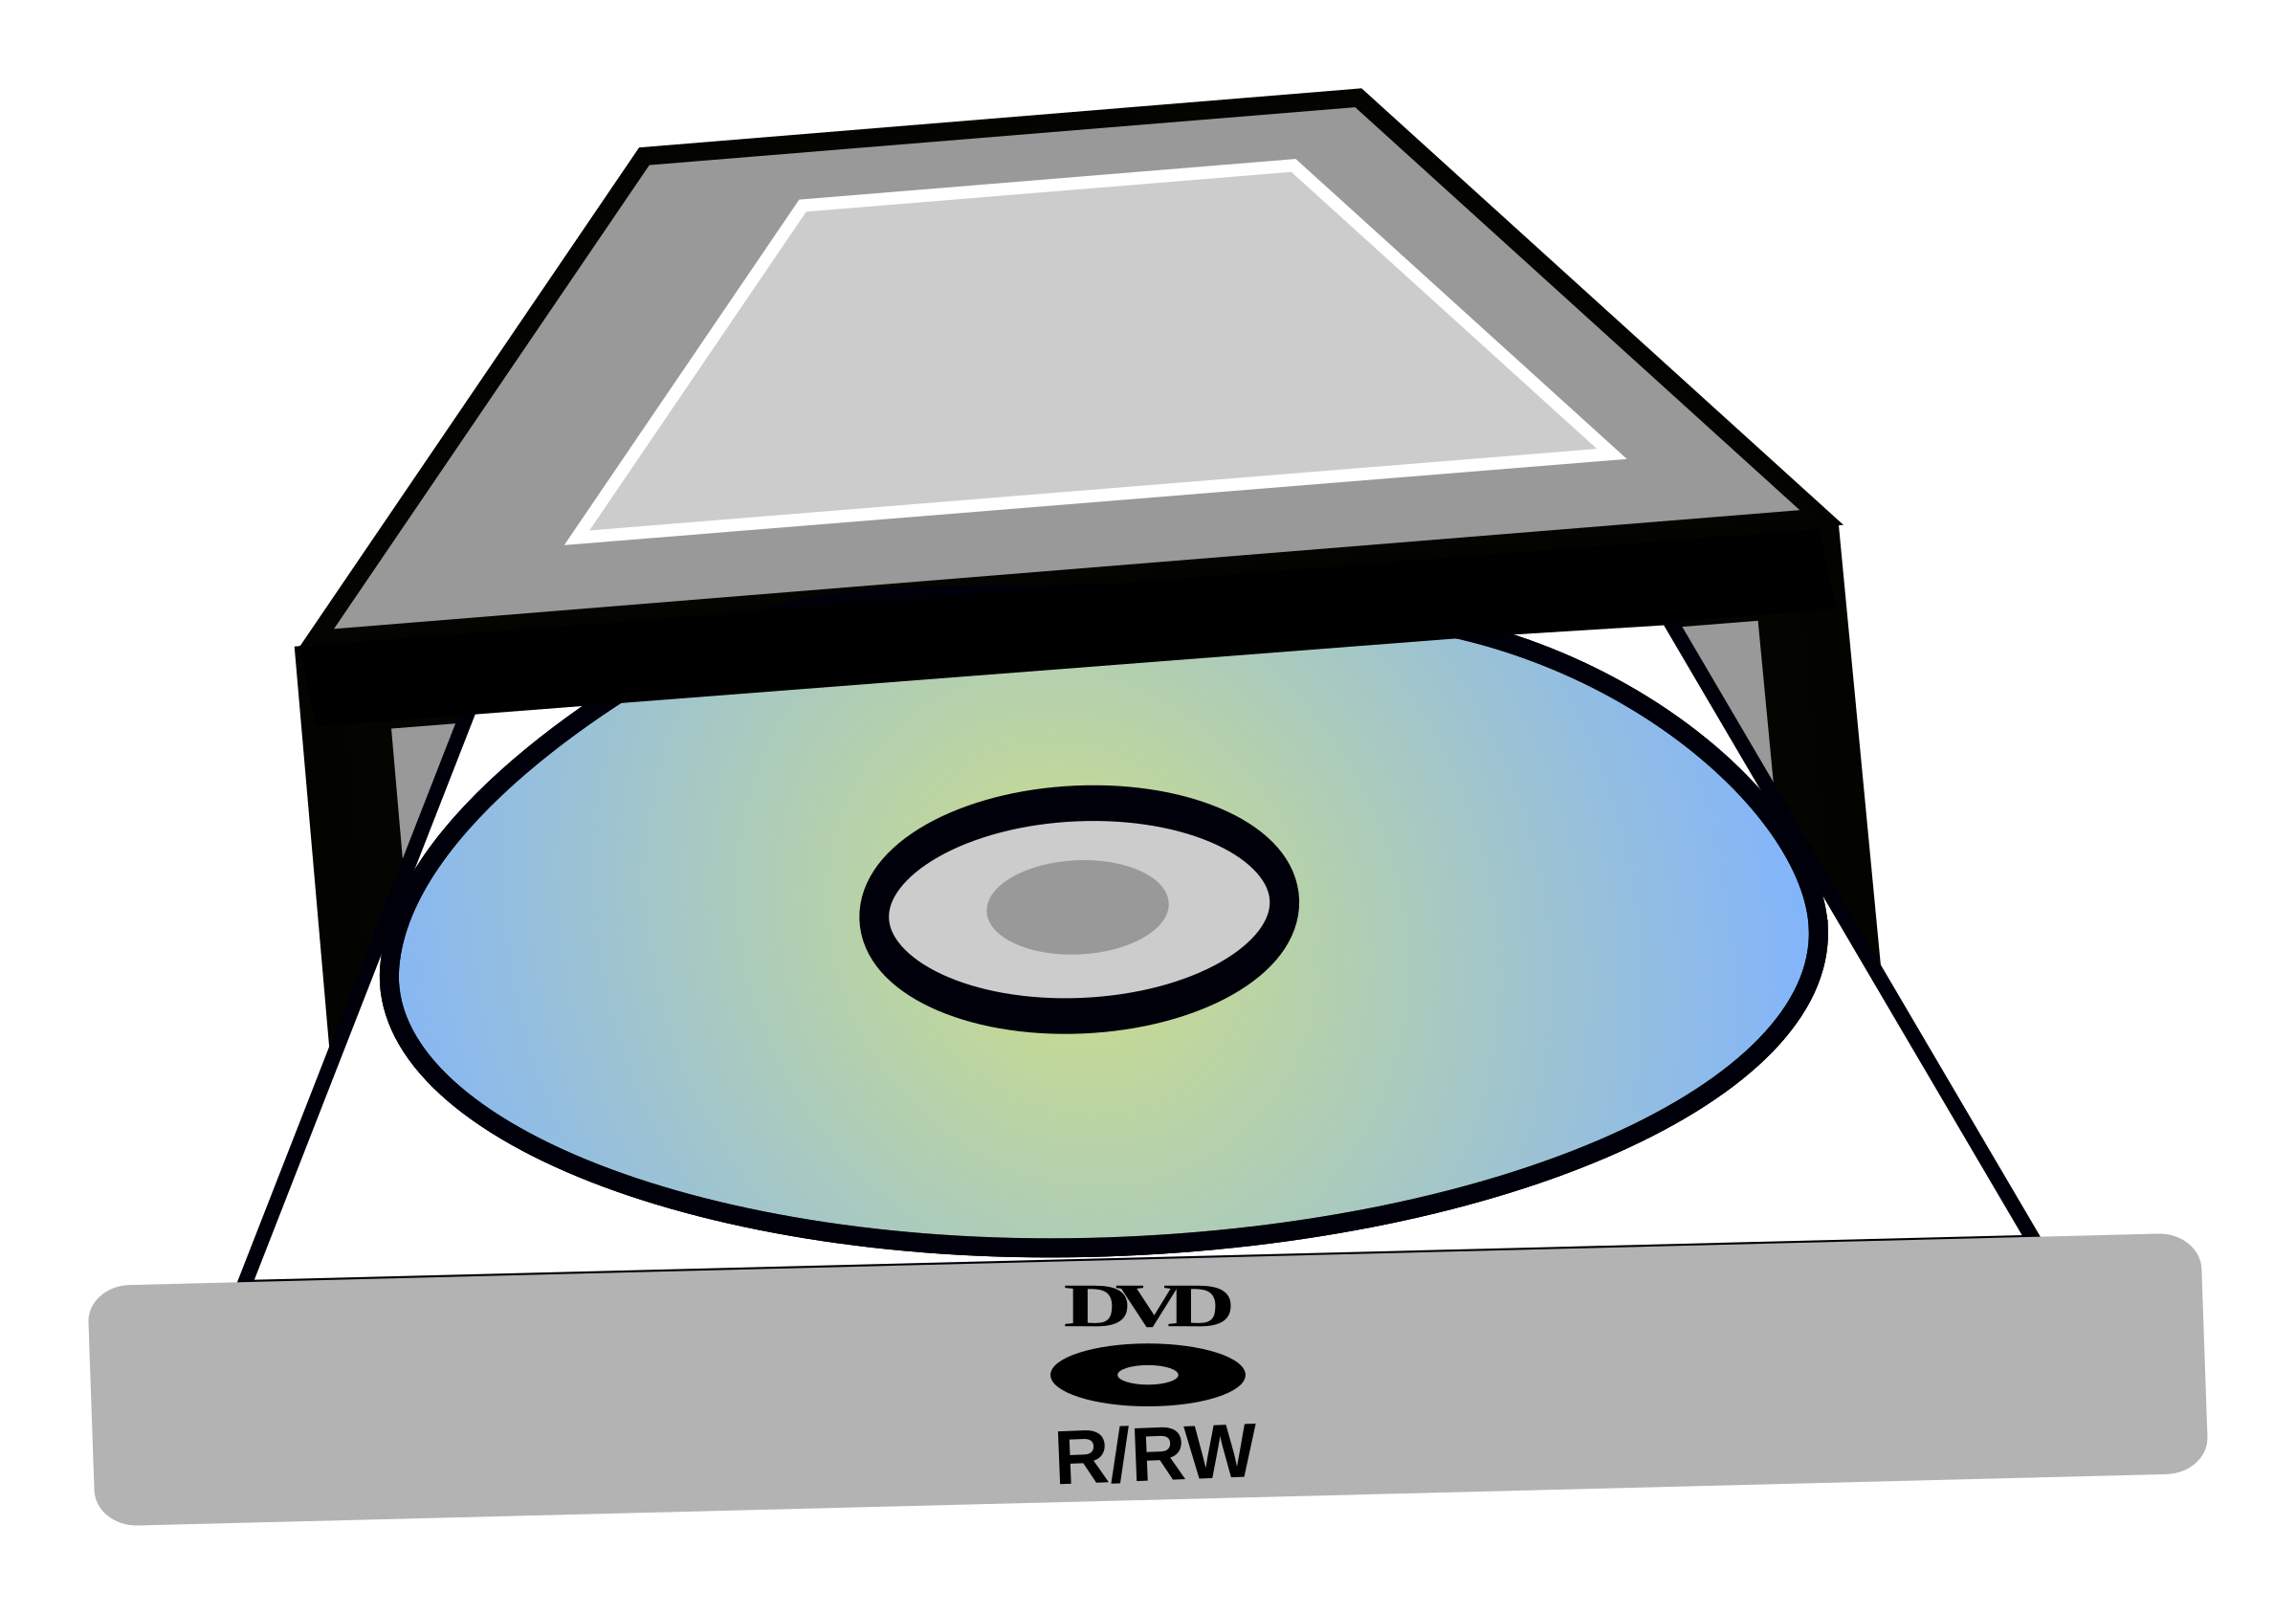 Cd clipart optical drive. Dvd rw big image